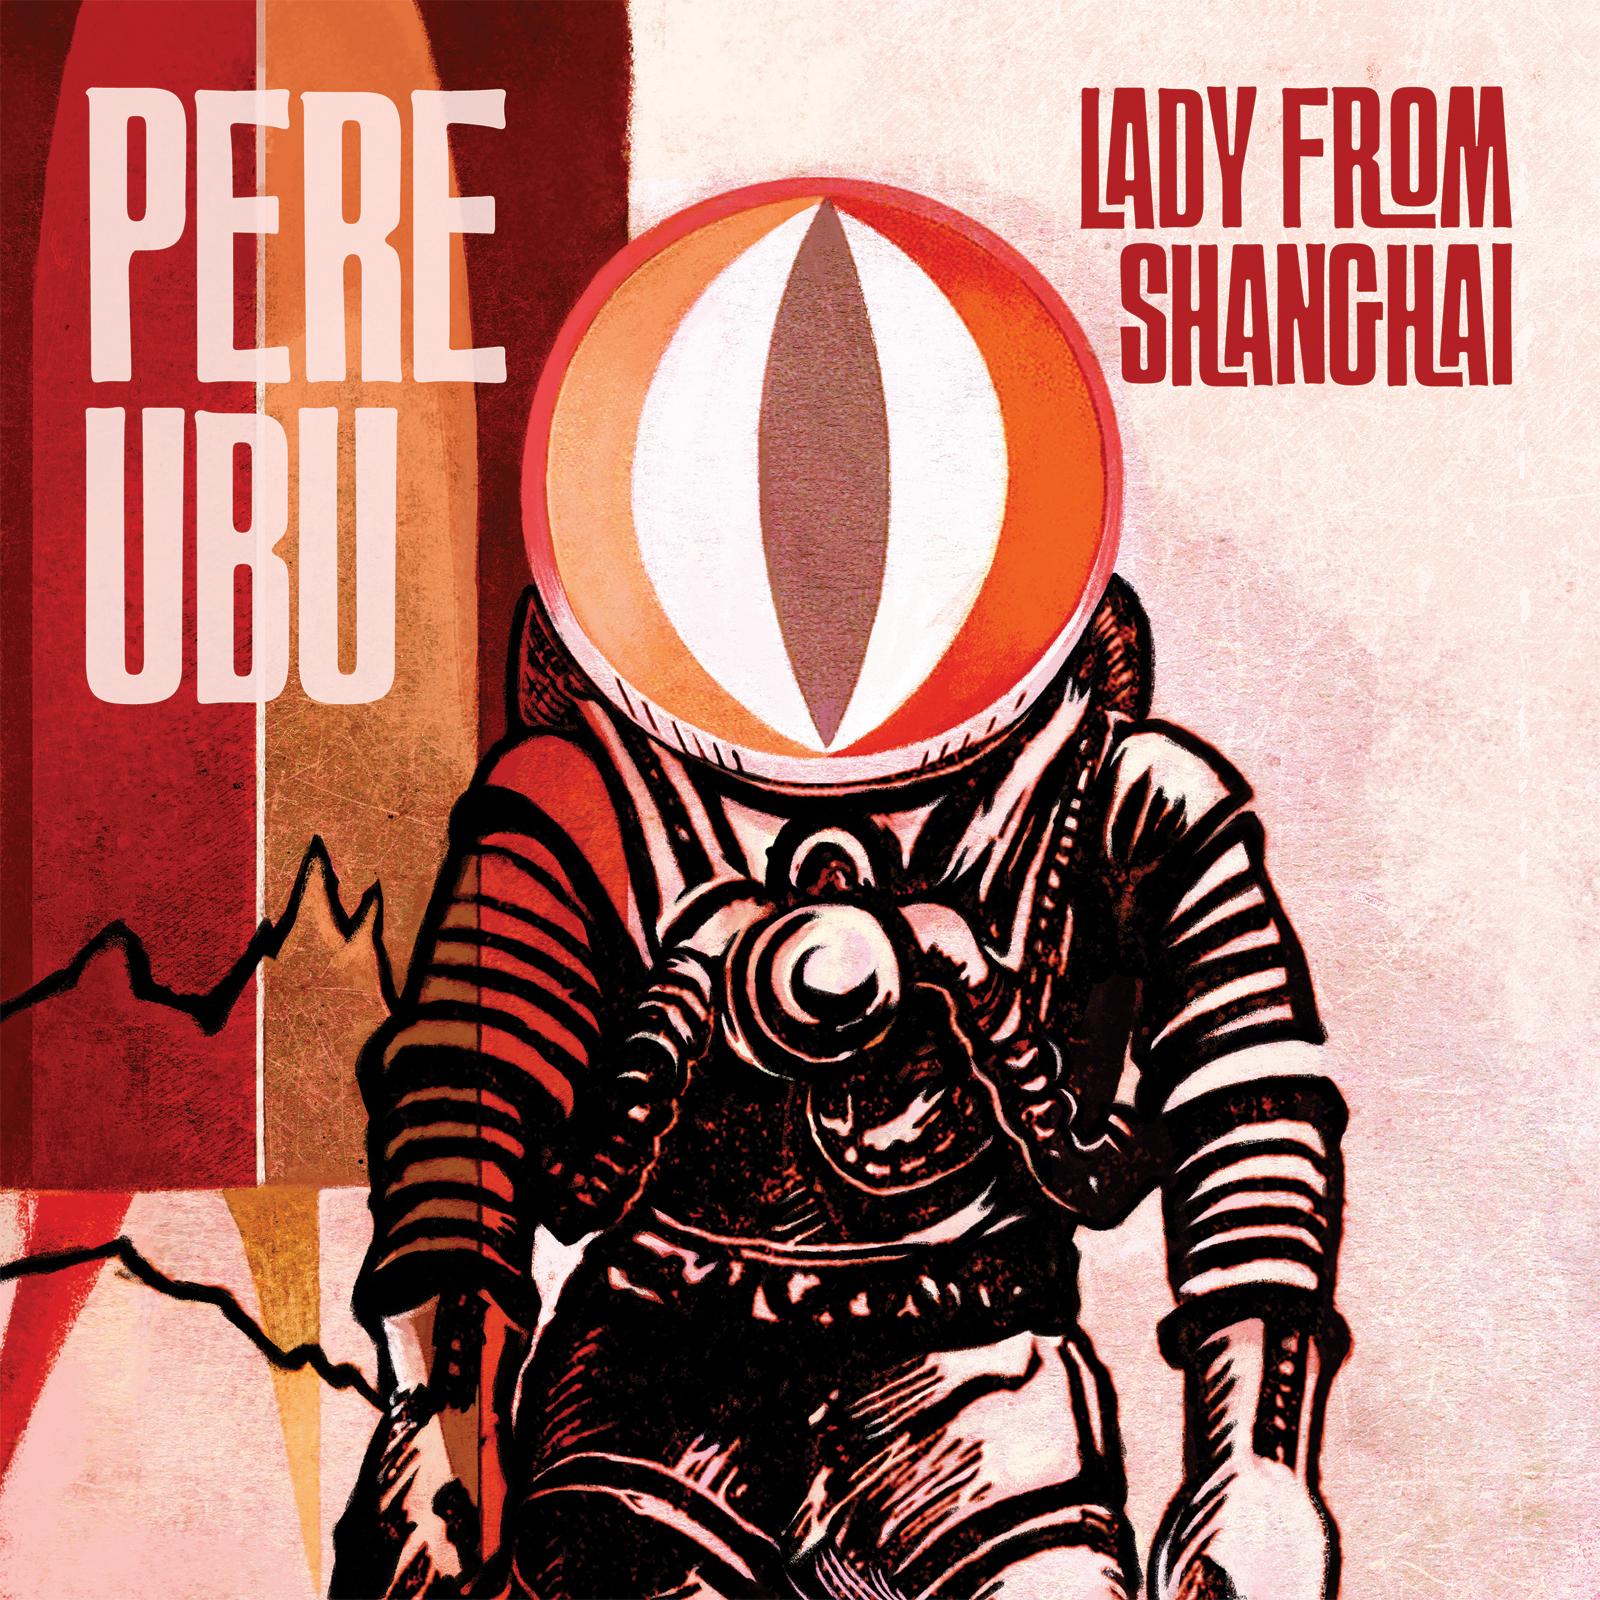 Pere Ubu's Lady From Shanghai album